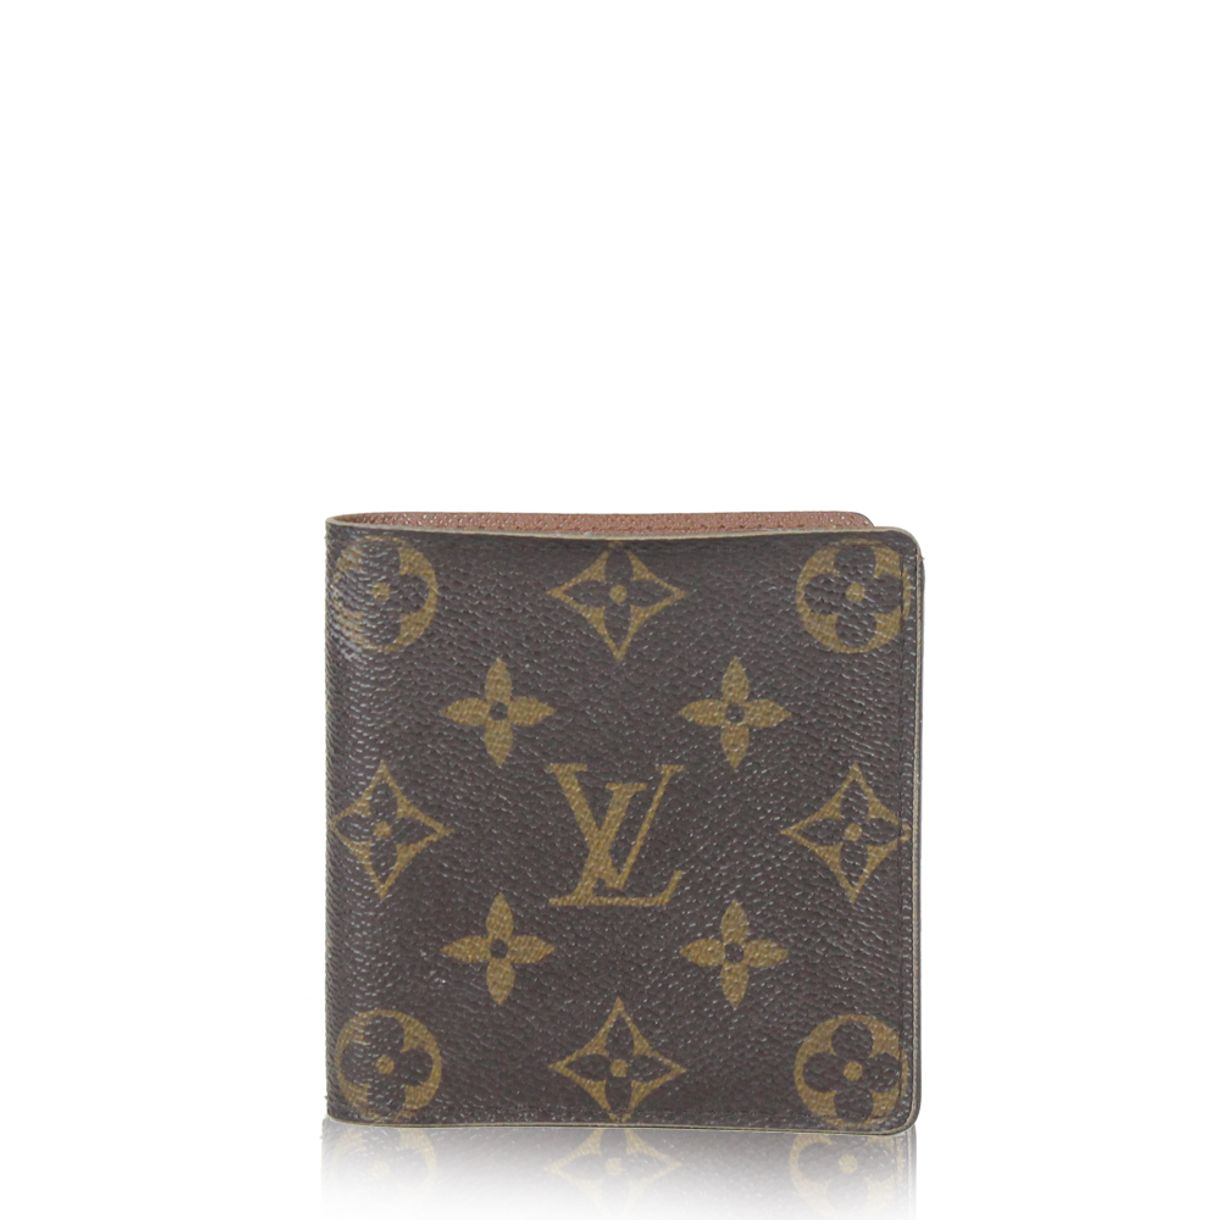 Carteira-Louis-Vuitton-Square-Monograma